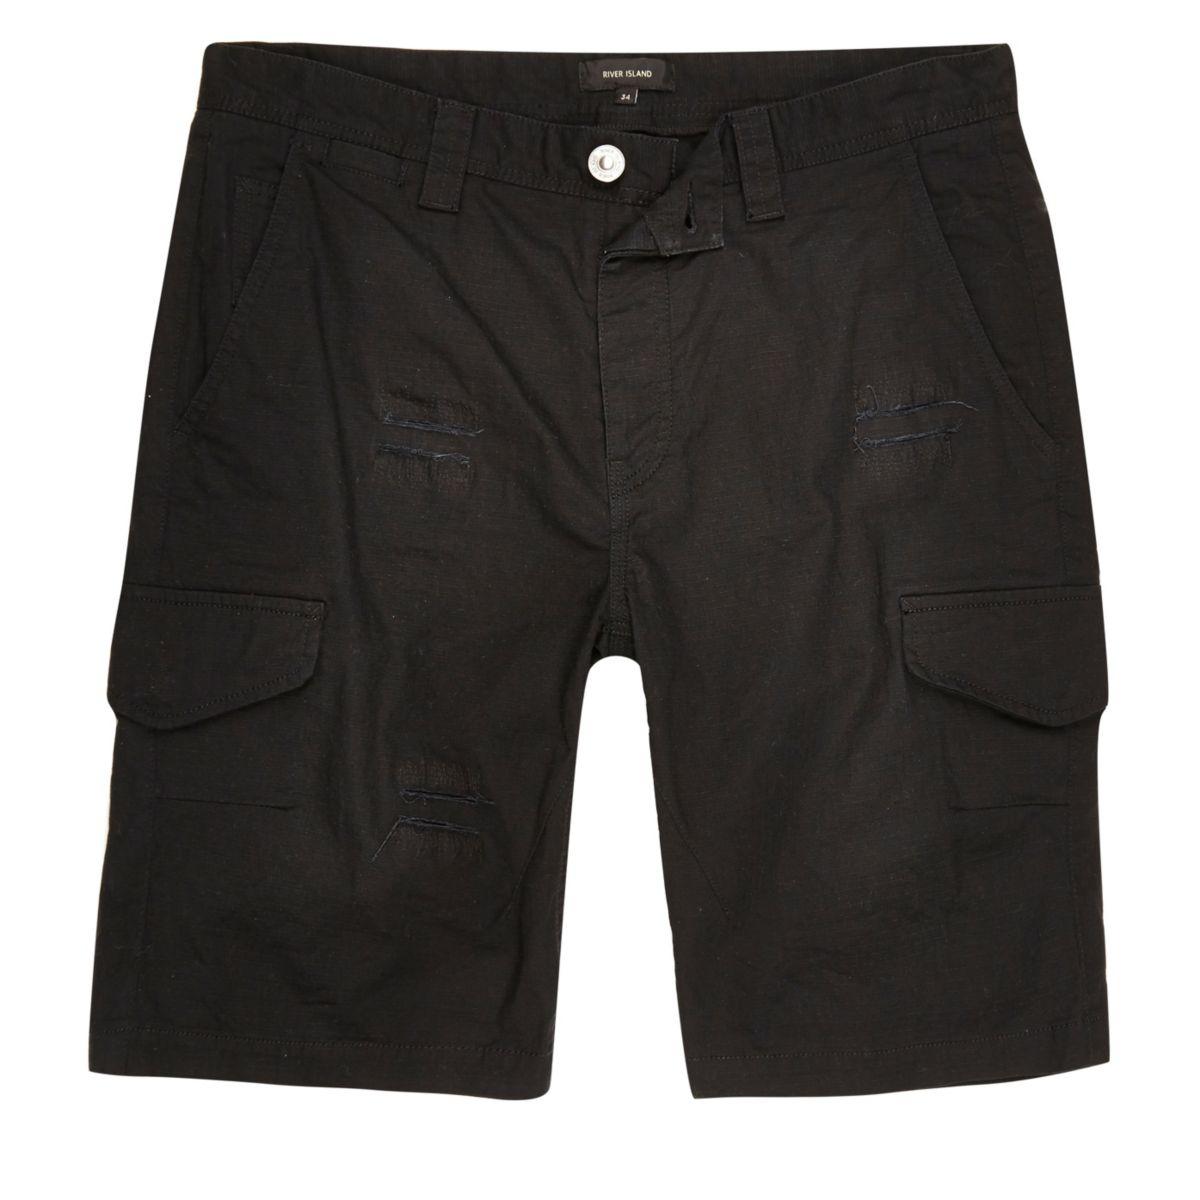 Black slim fit distressed cargo shorts